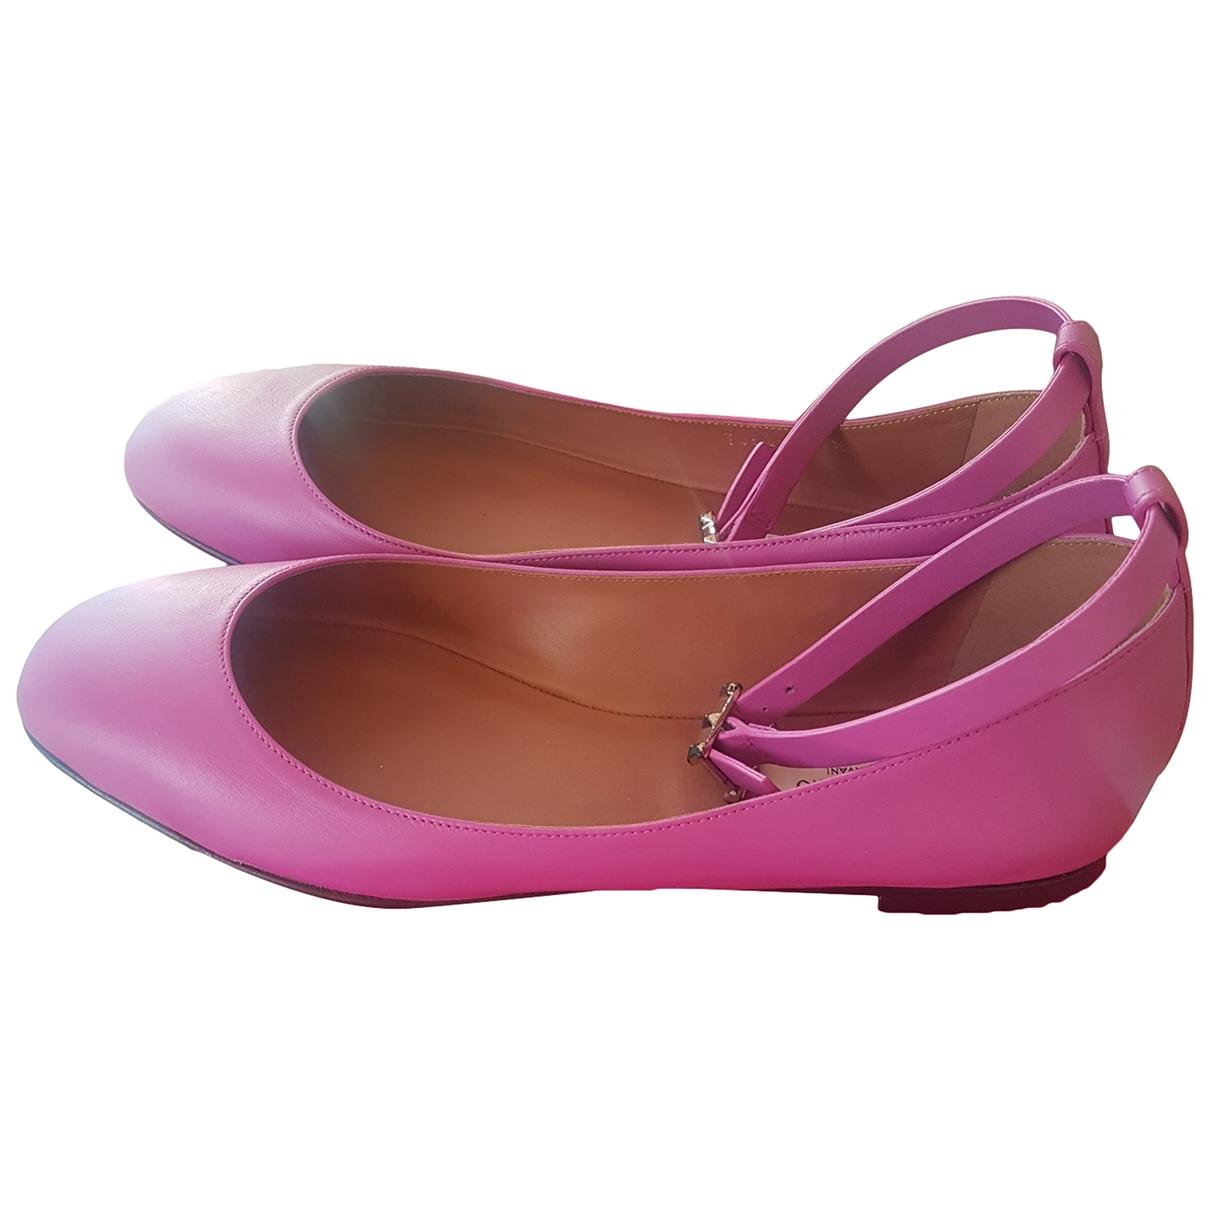 Valentino Garavani - Ballerines Tango pour femme en cuir - rose